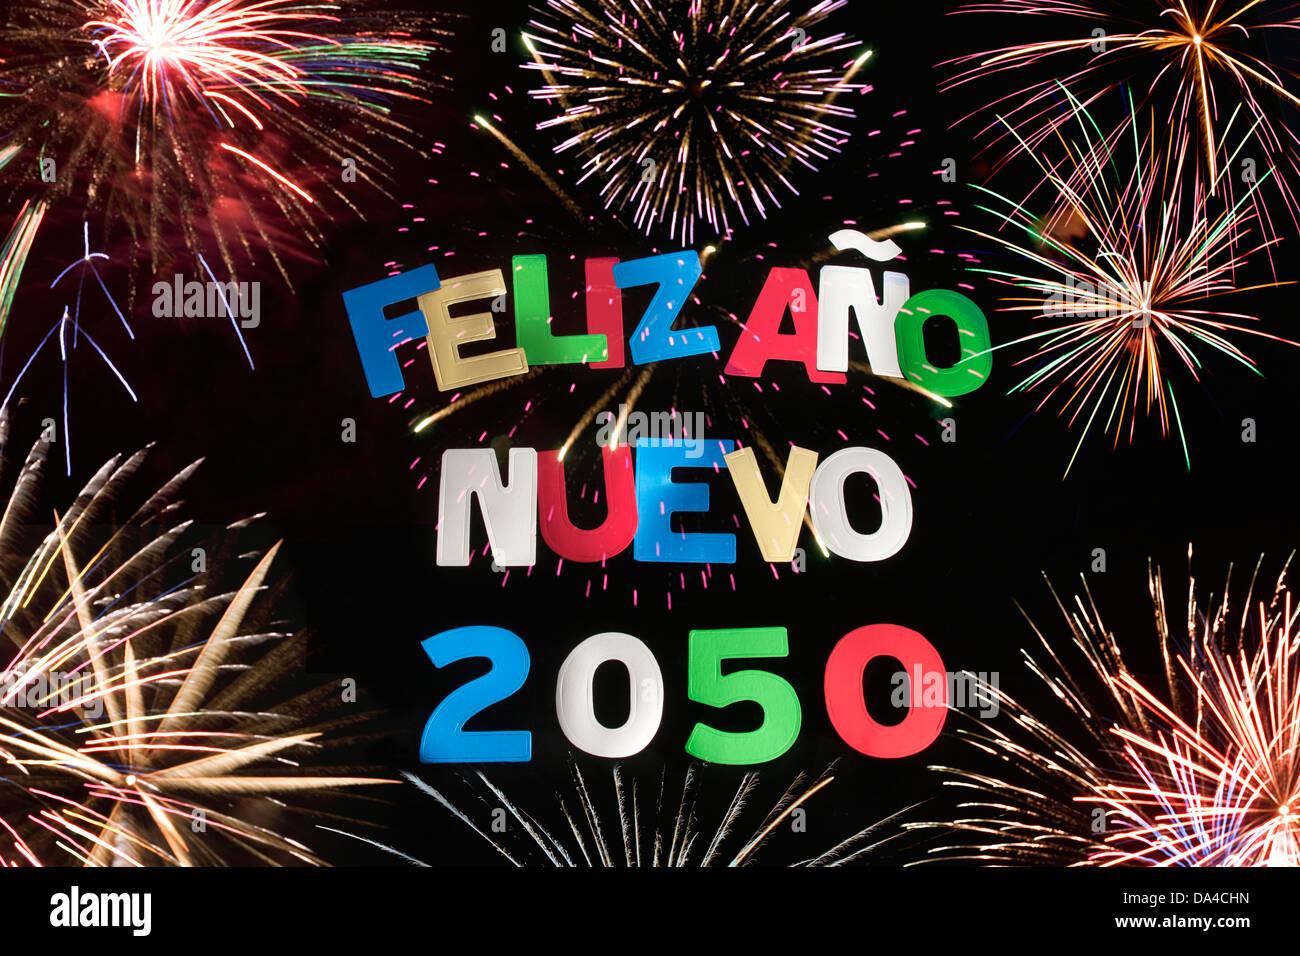 FELIZ ANO NUEVO 2050 Stock Photo, Royalty Free Image